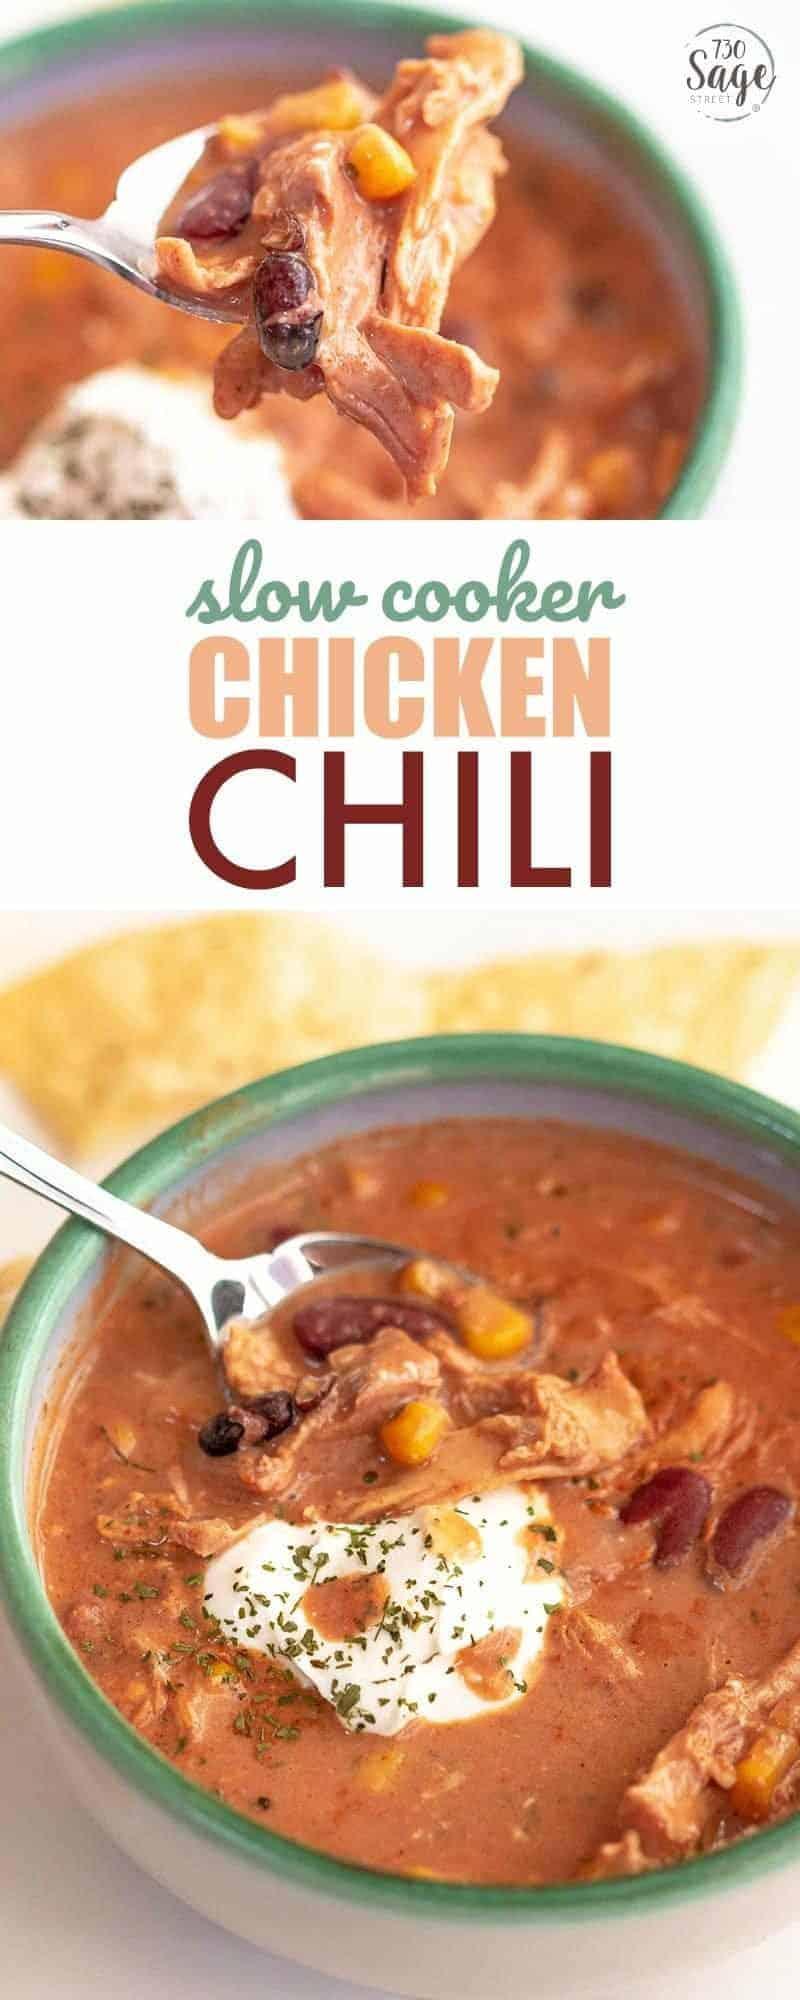 Slow cooker chicken chili recipe.